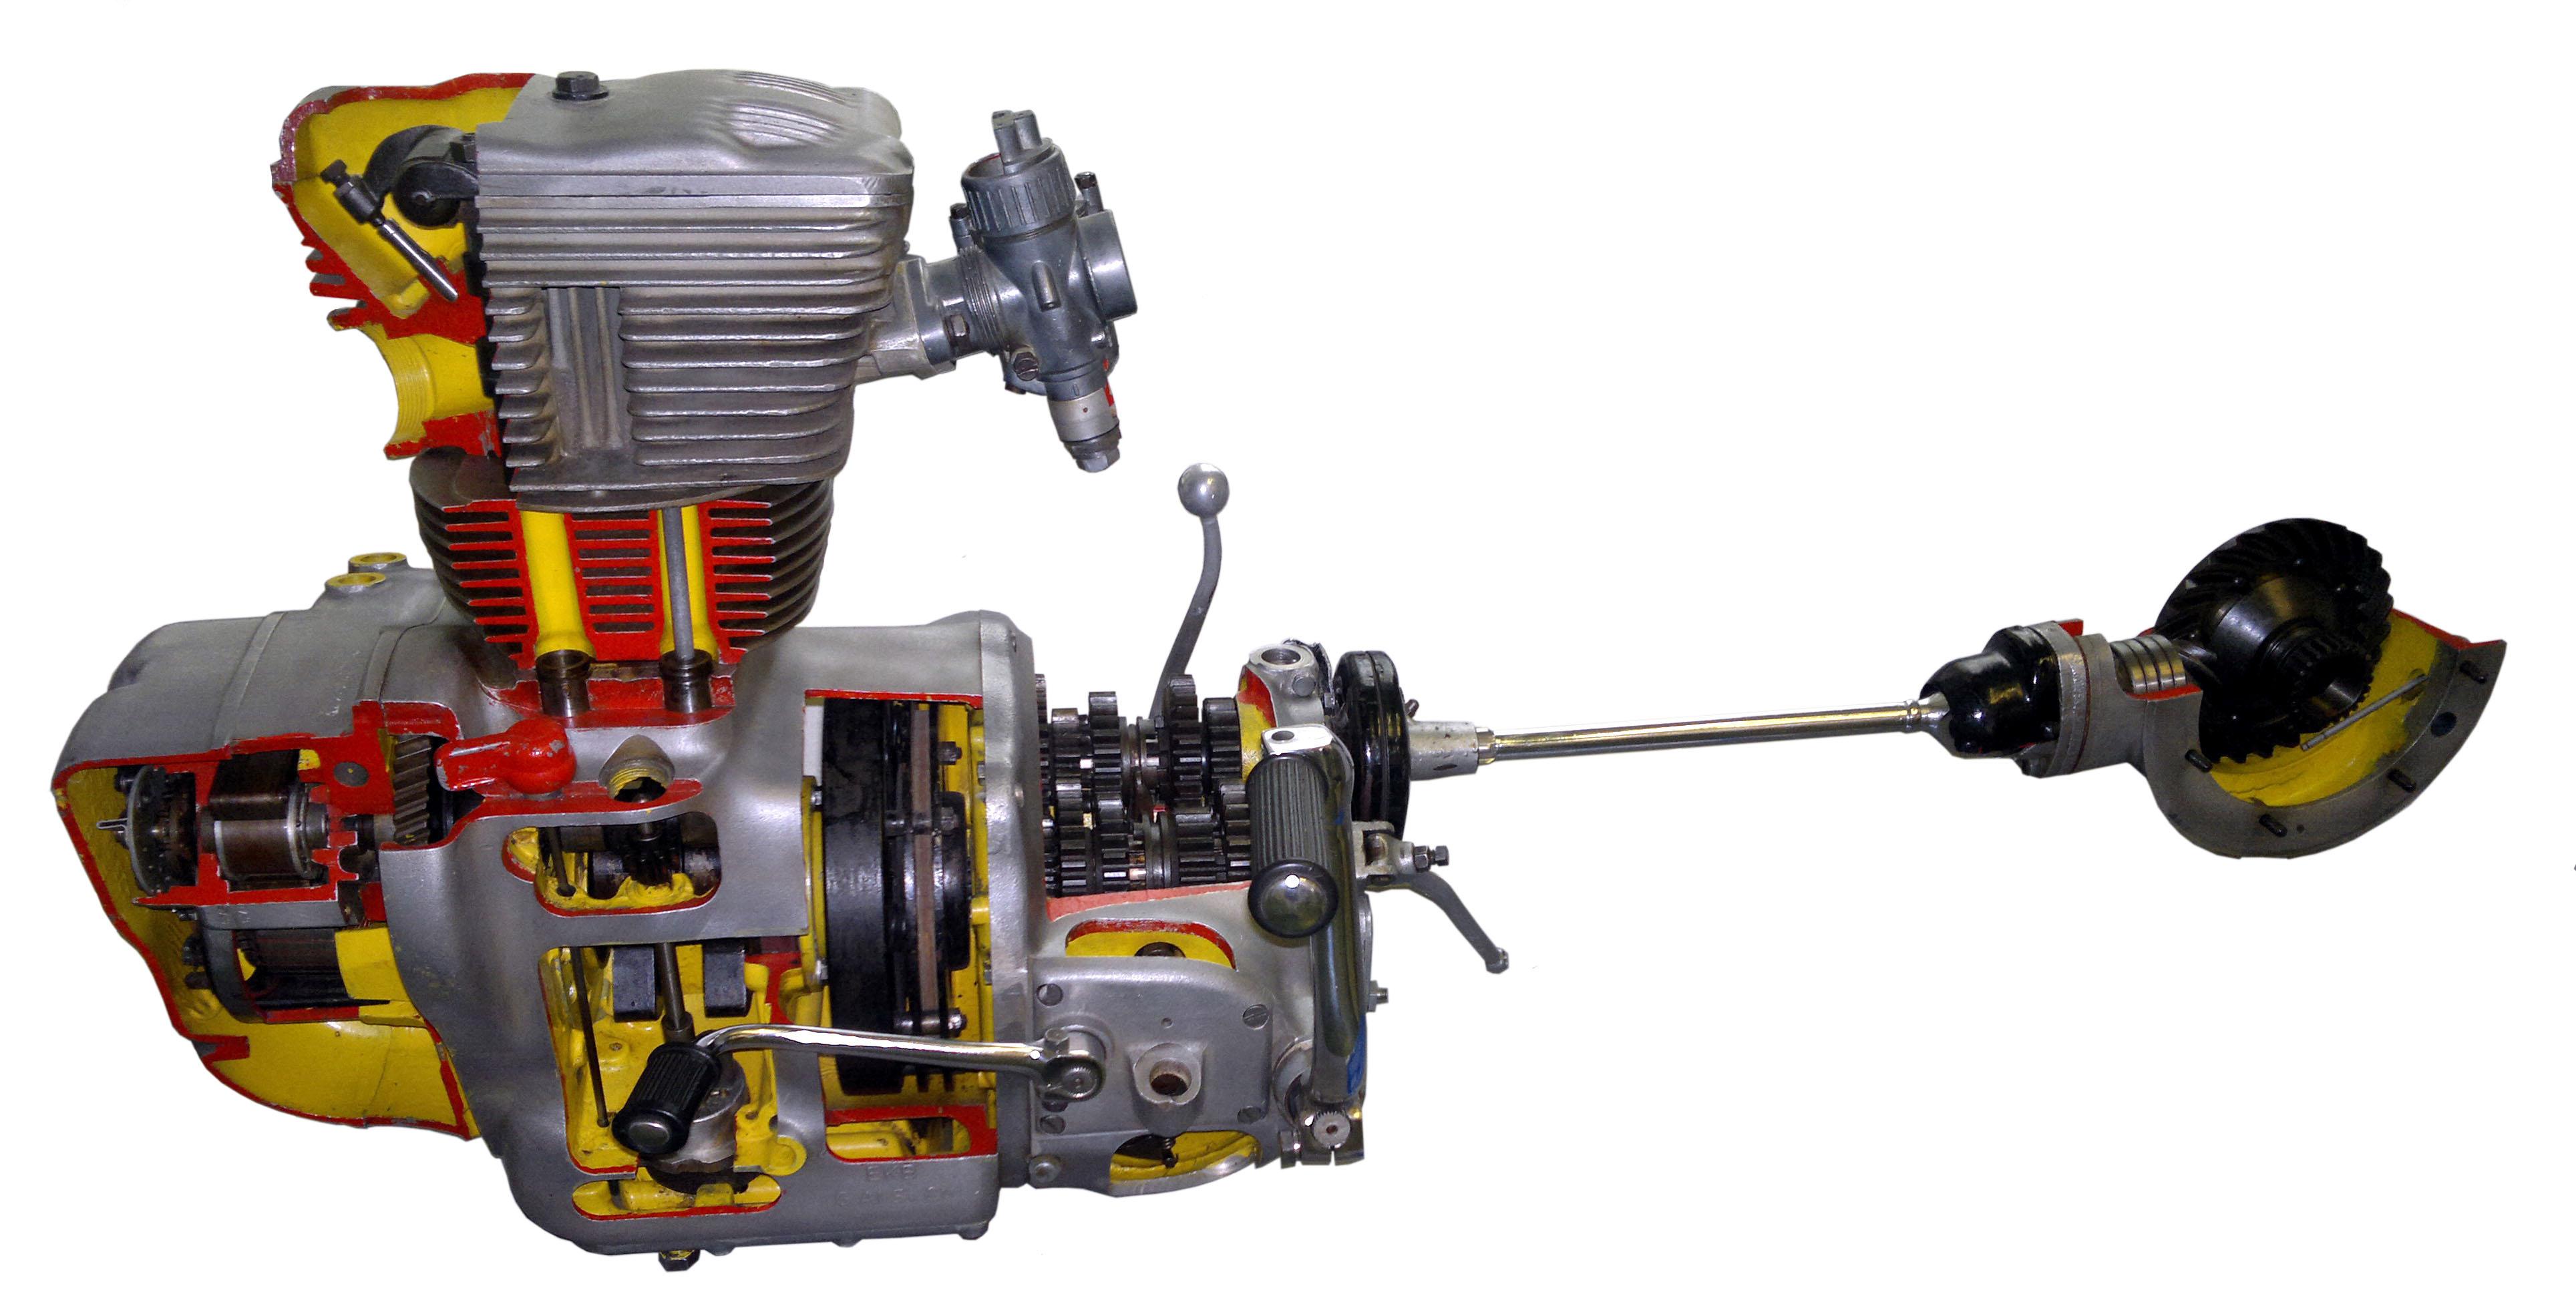 Antriebsstrang einer AWO 425 S